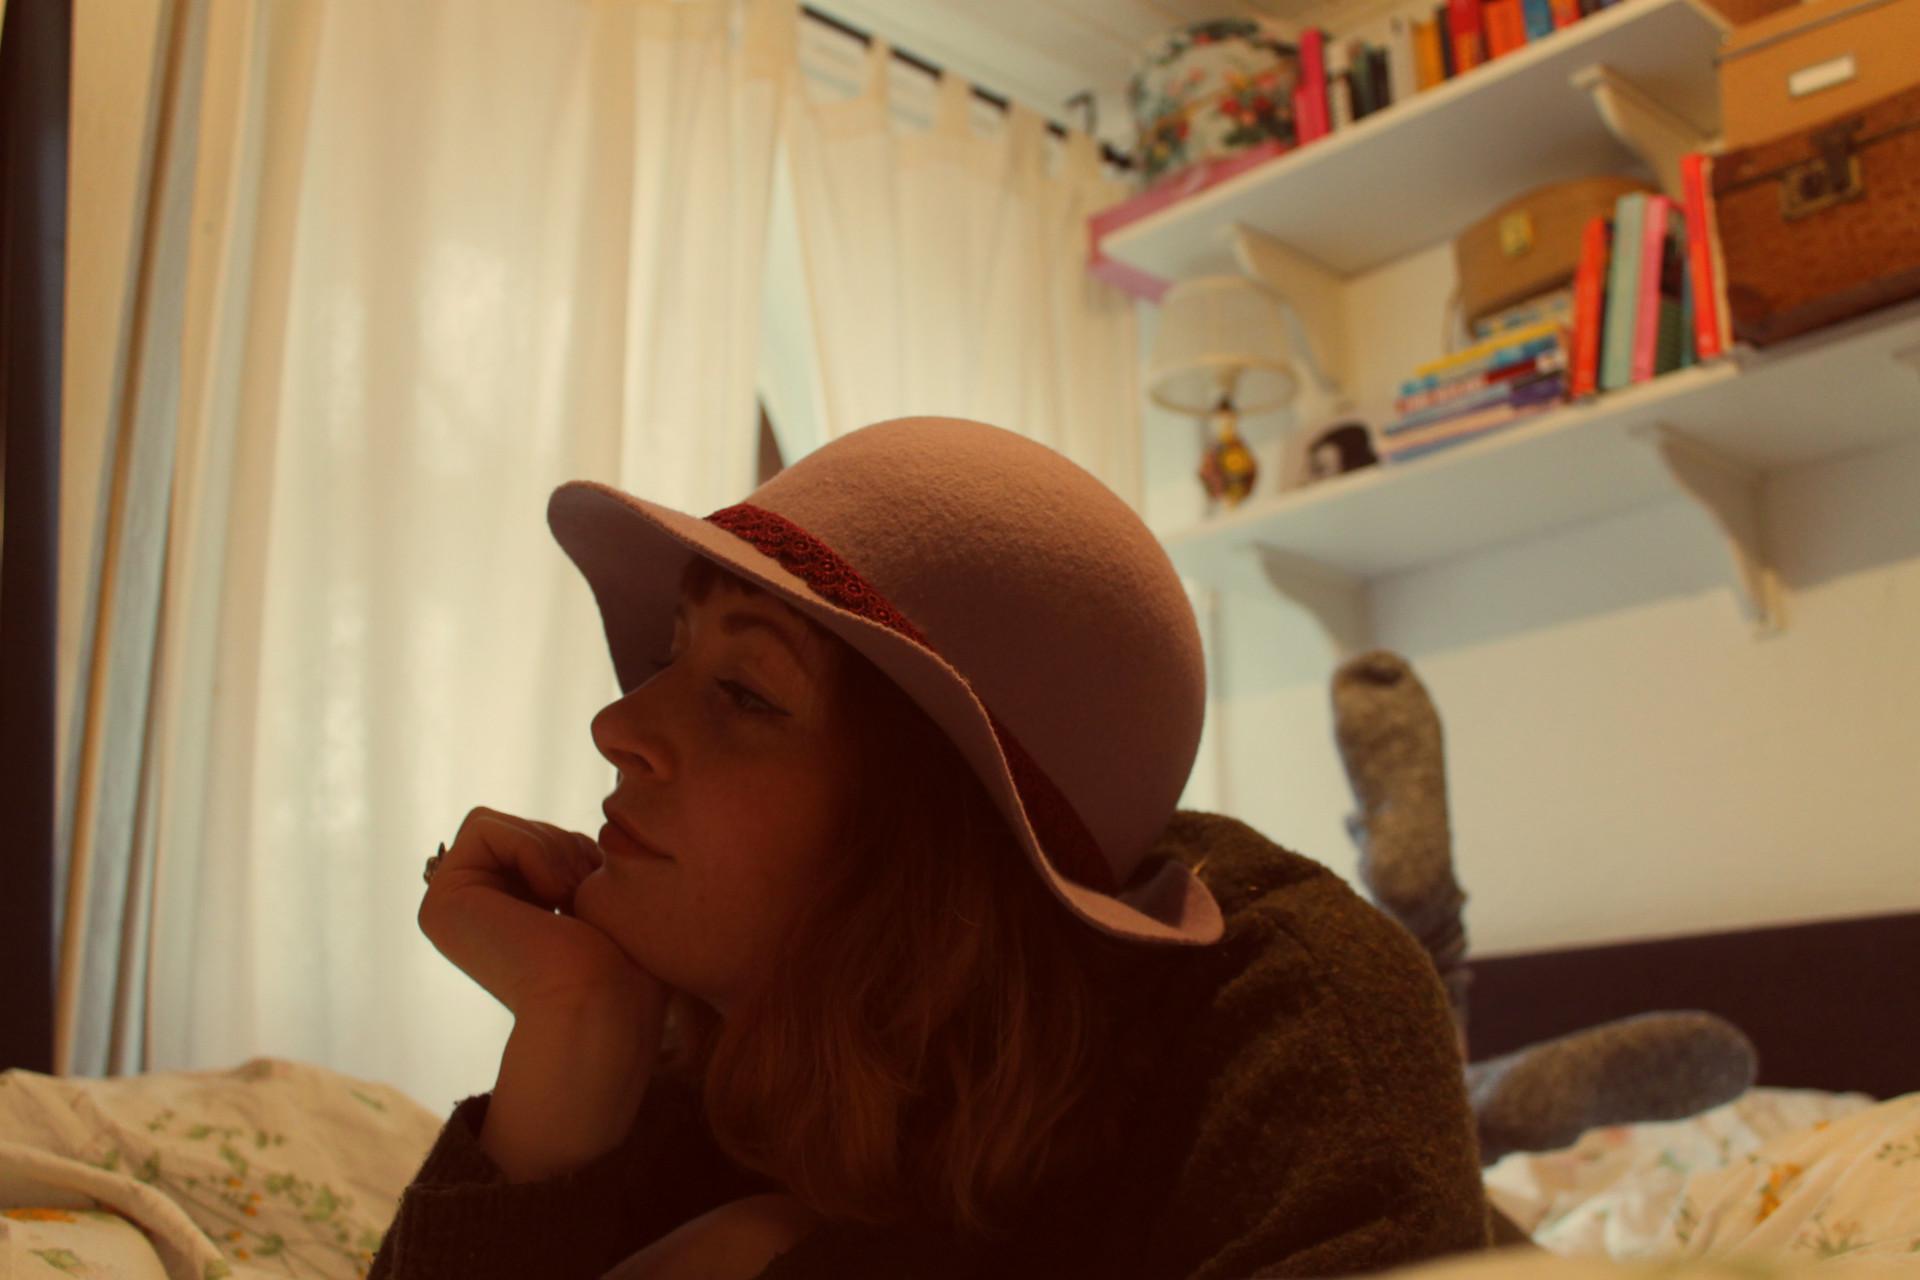 Paula_bed3